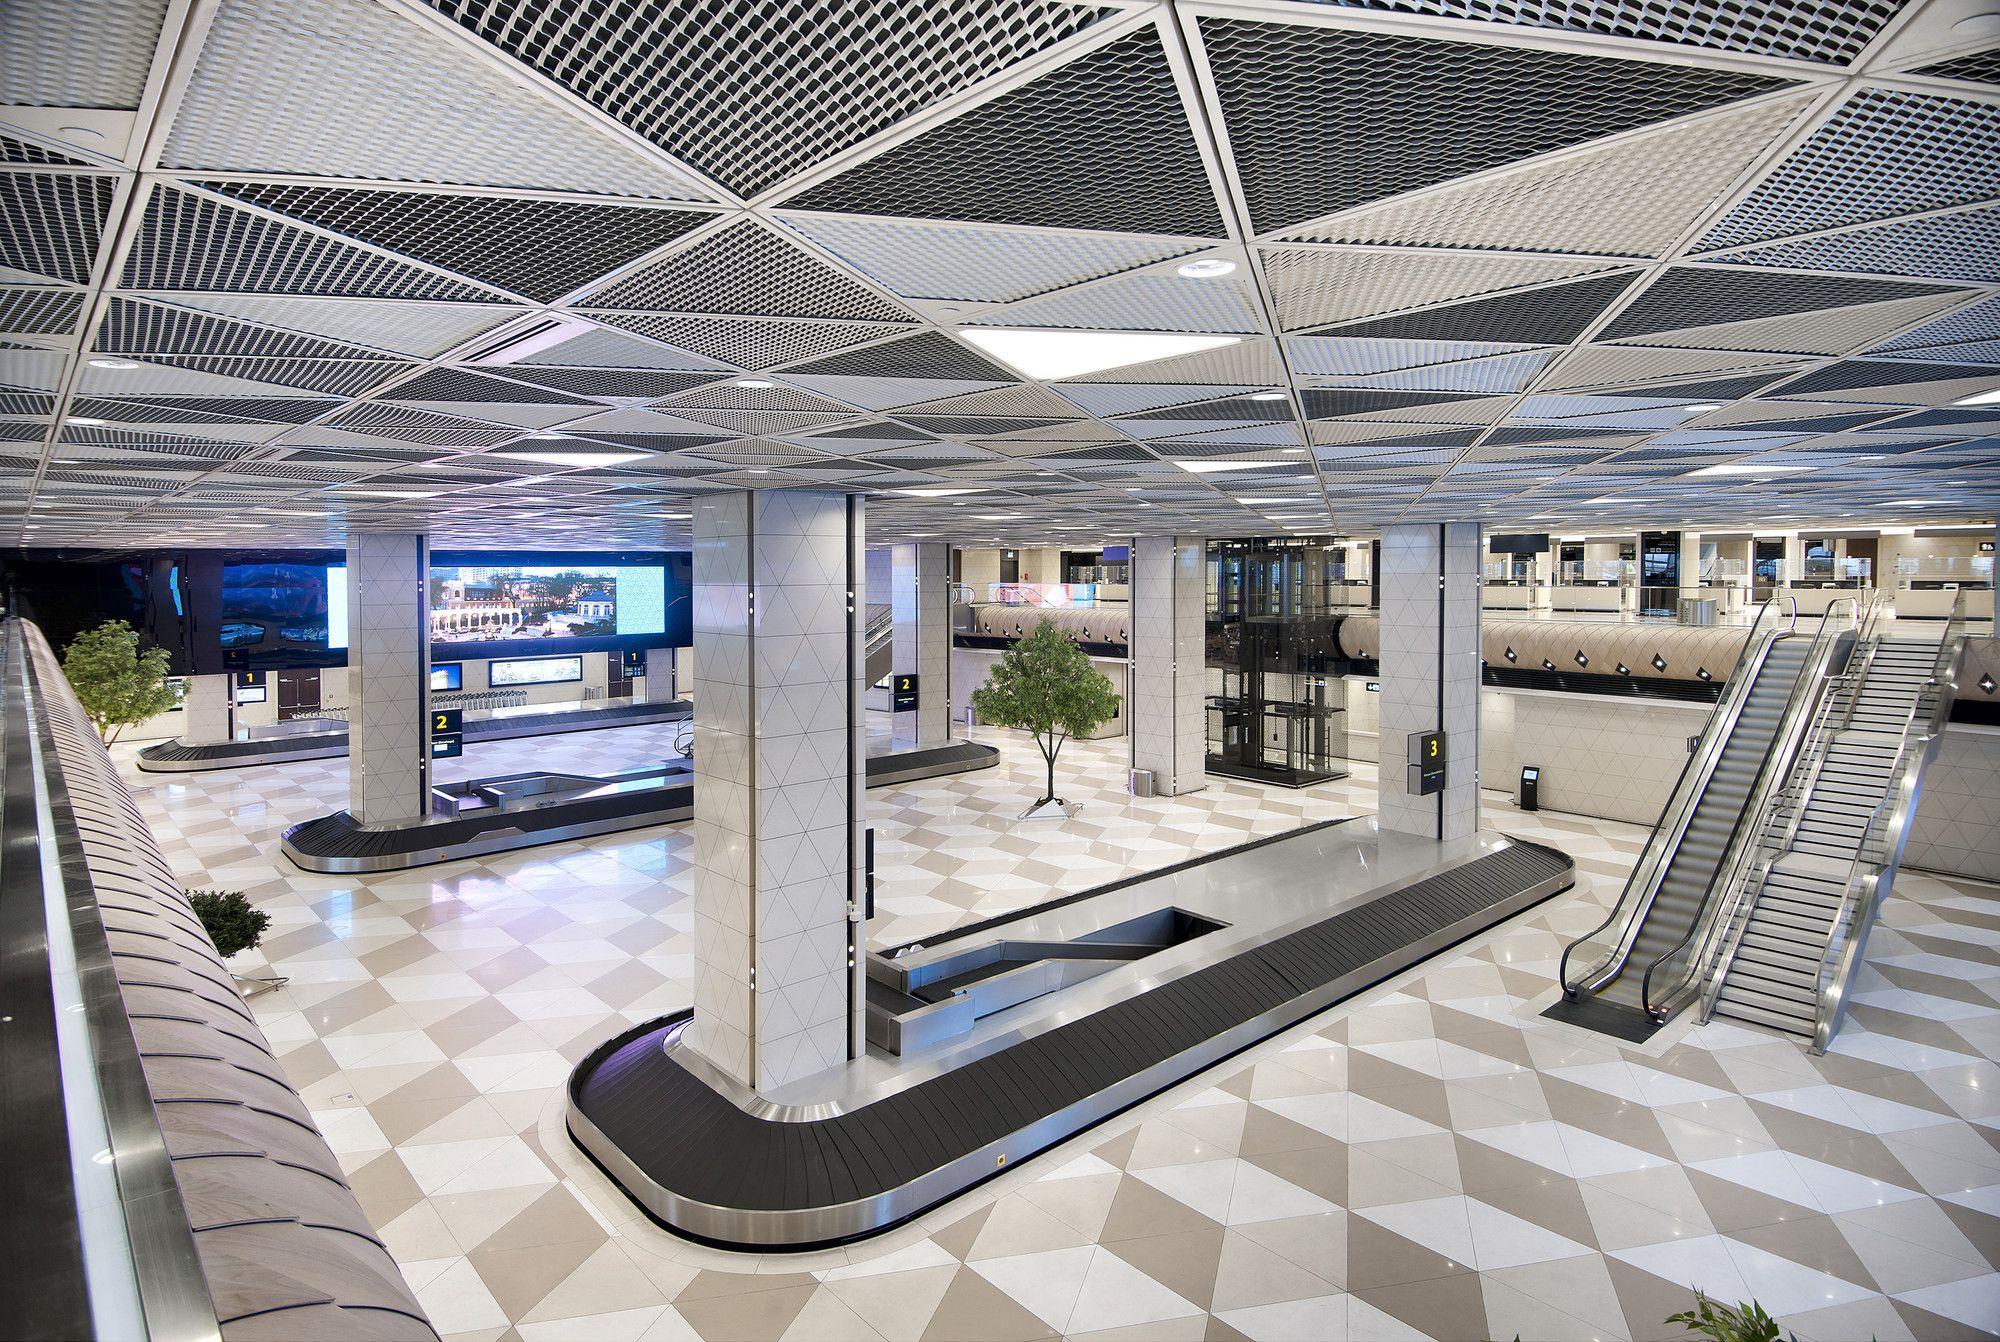 Gallery Of Heydar Aliyev International Airport Baku Autoban 7 Airport Design International Airport Architecture